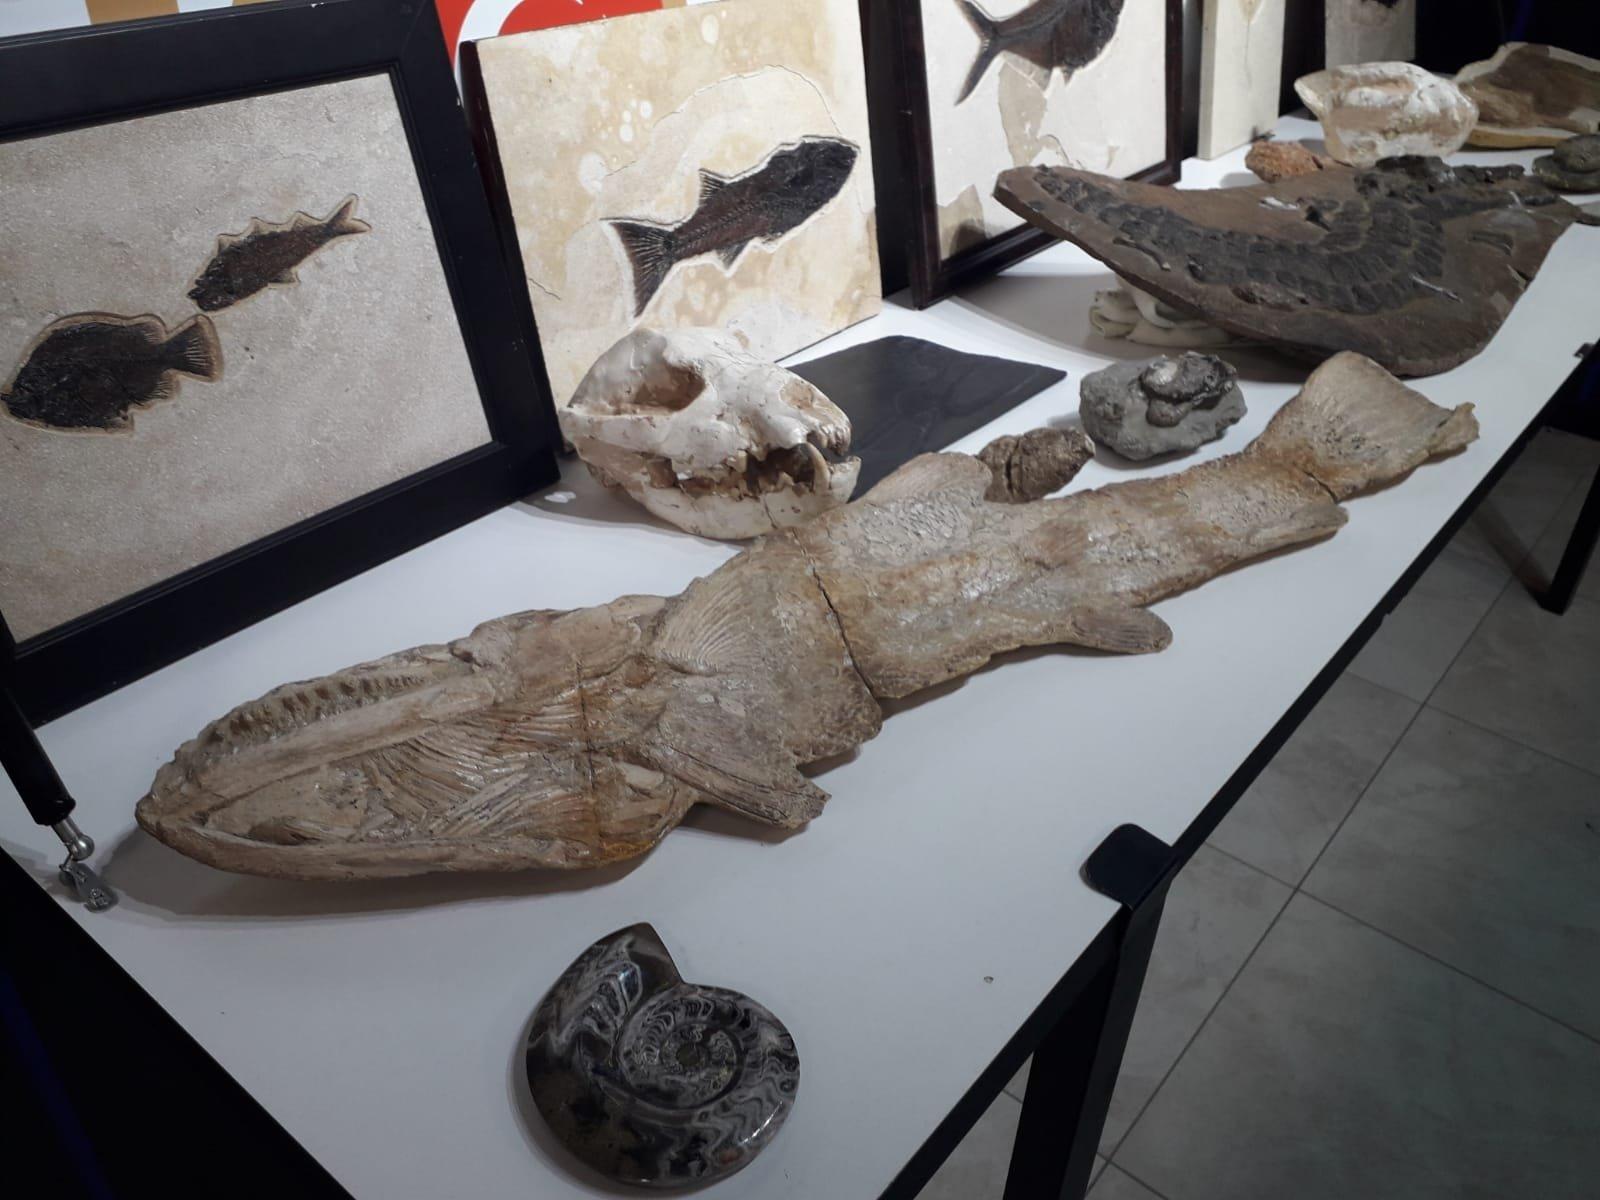 Turkish police seize ancient fossils from Adnan Oktar cult